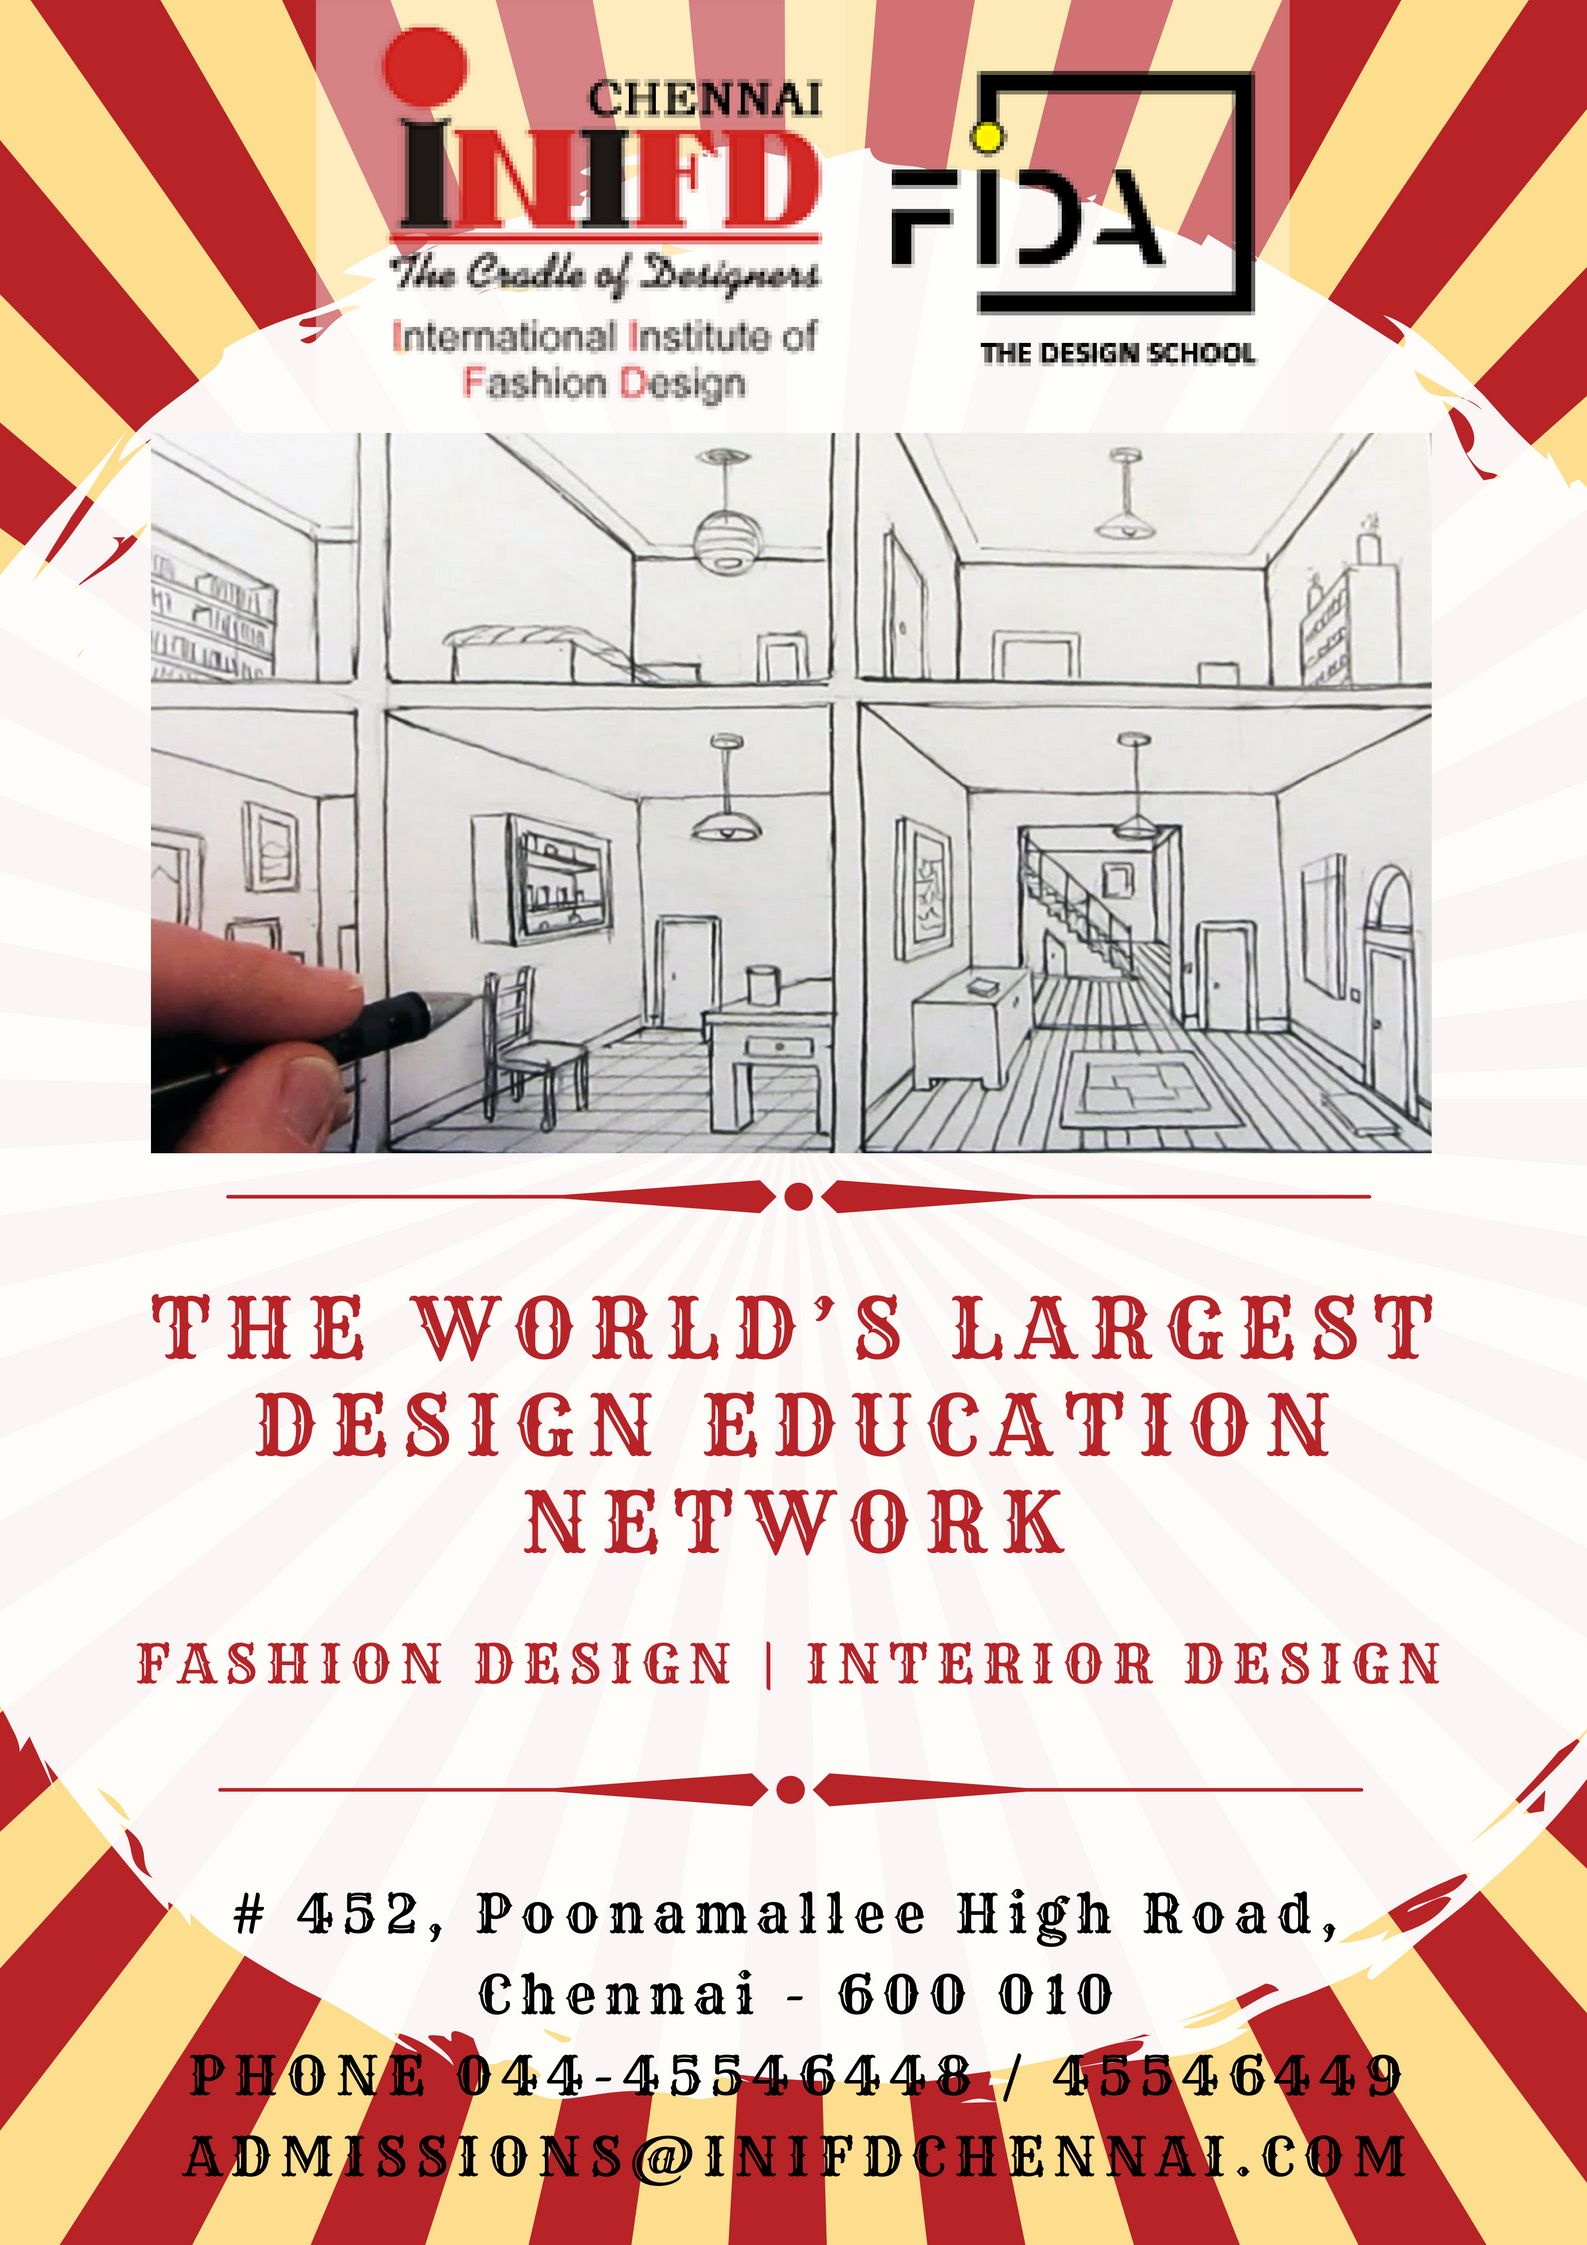 Pin By Vikramkenny On Fashion Interior Design Courses Interior